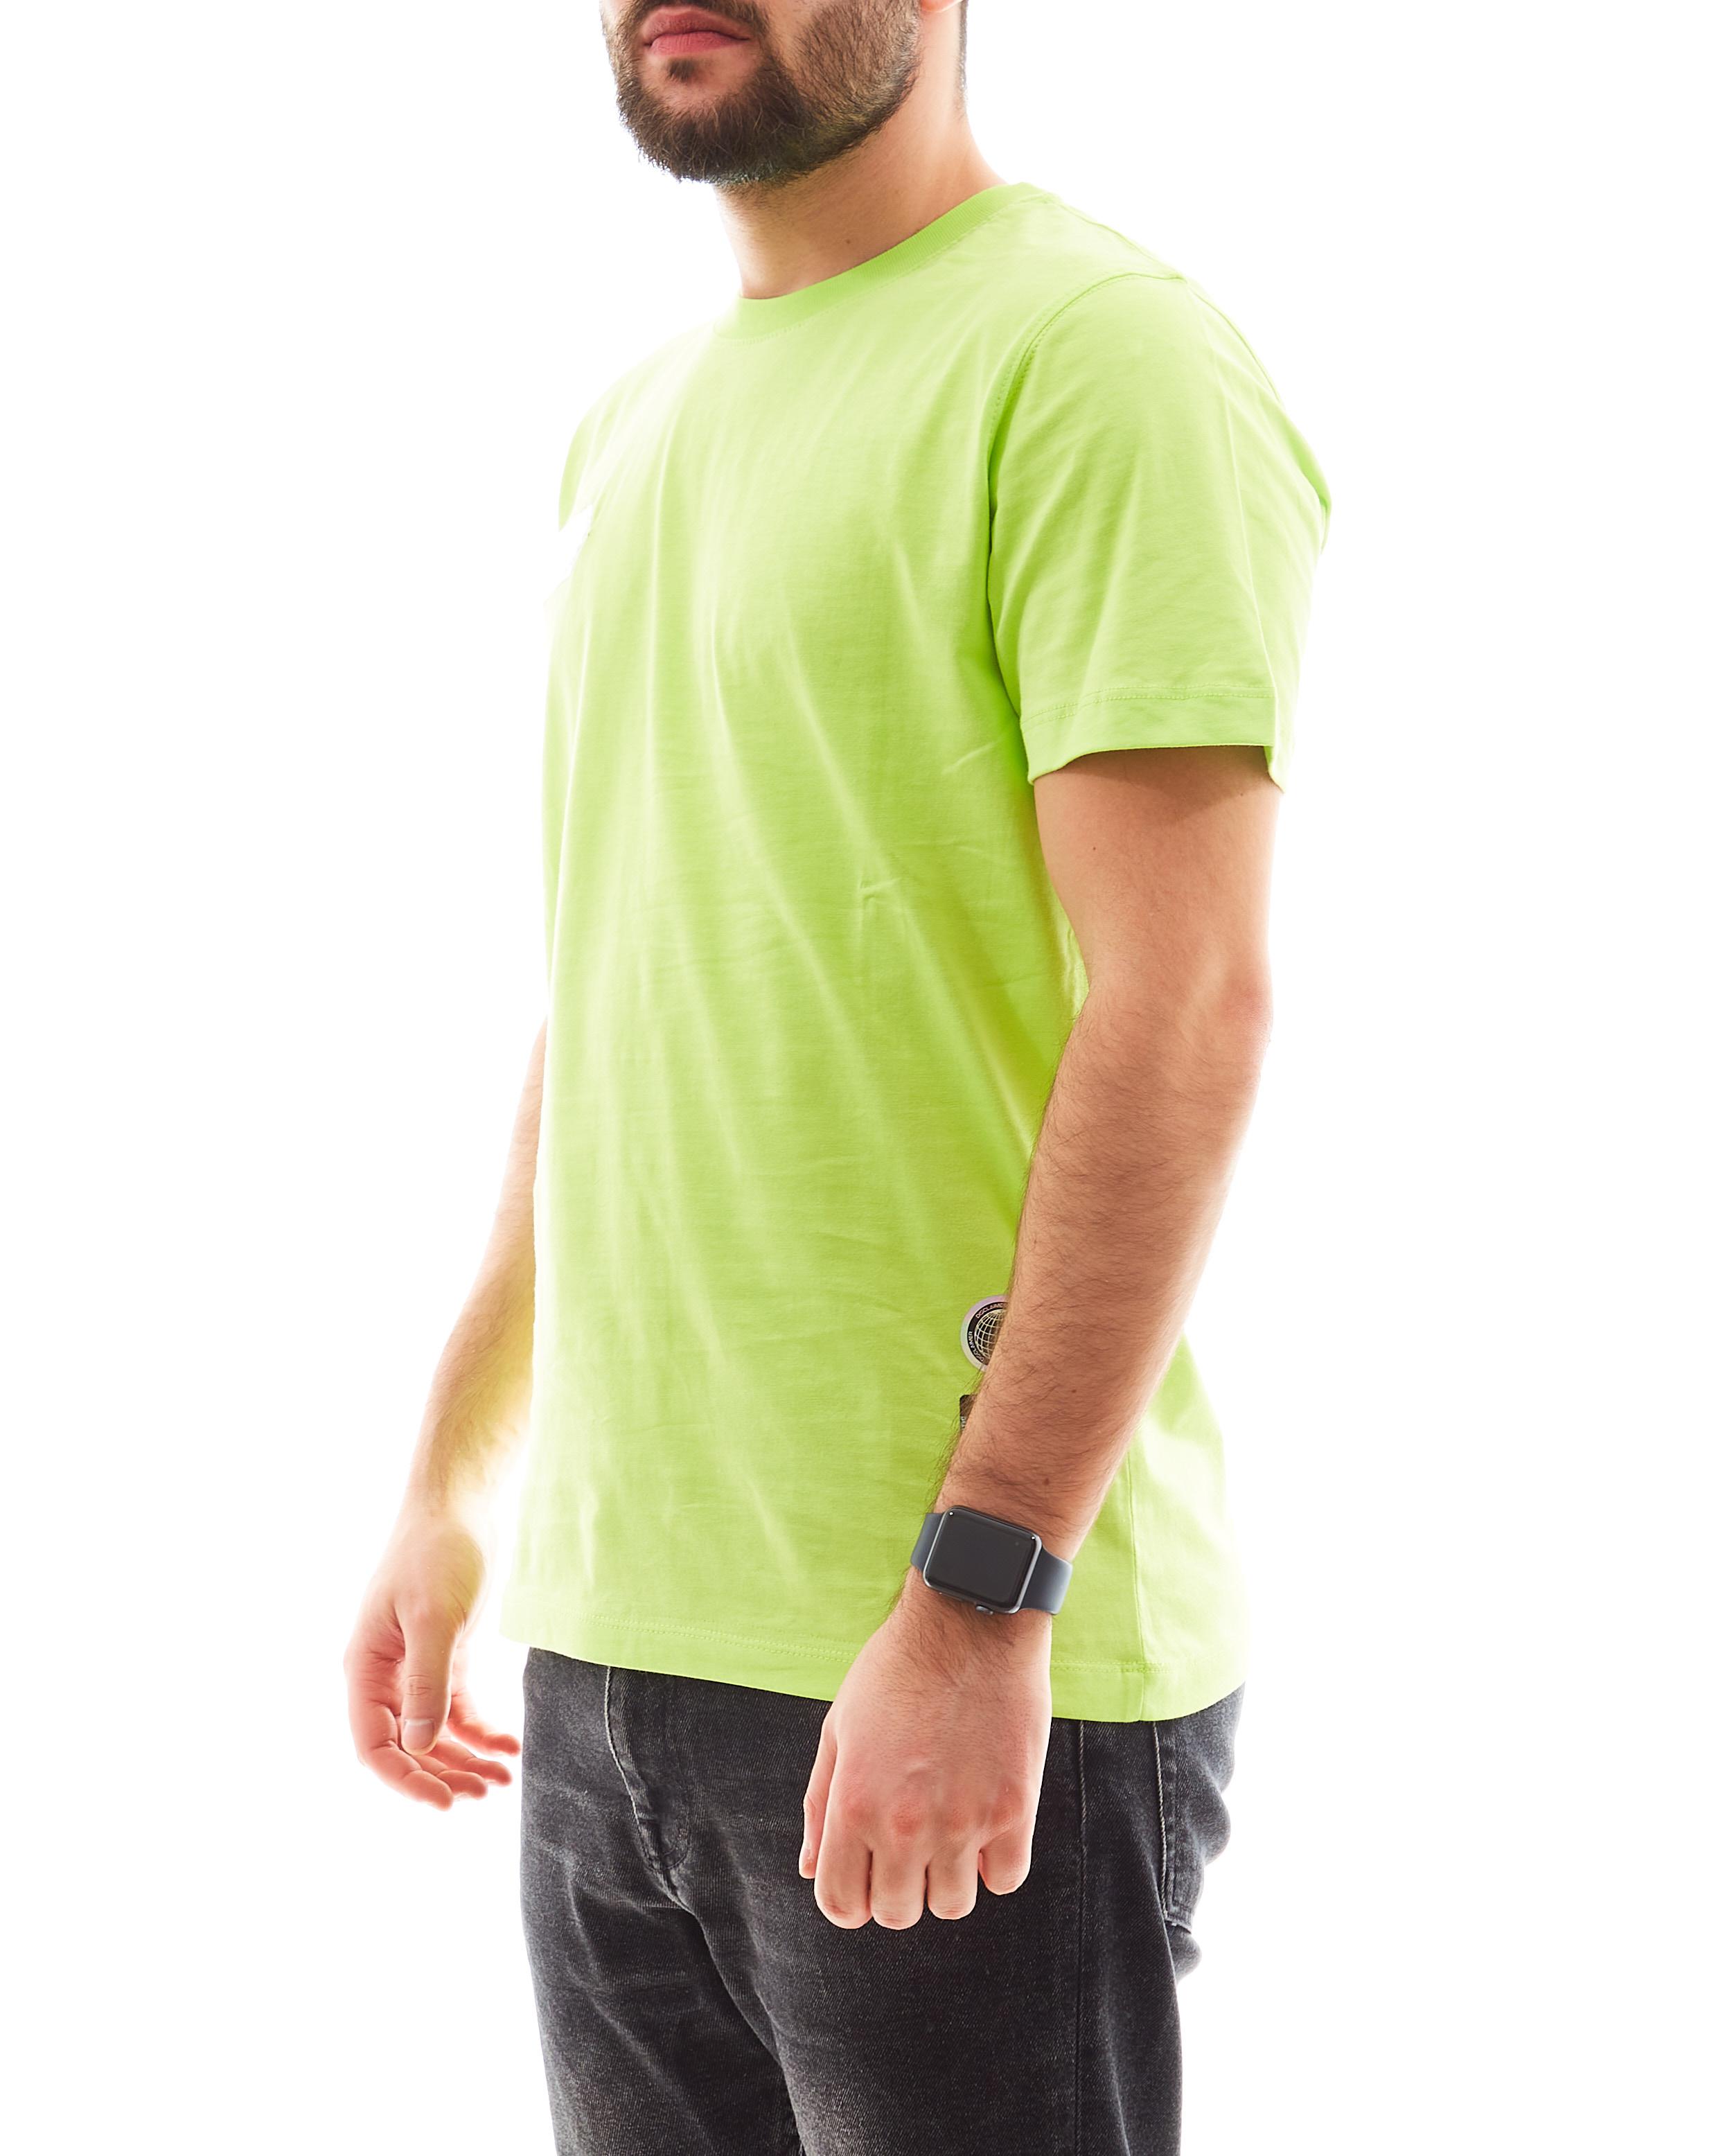 T-shirt DISCLAIMER | T-shirt | EDS50517GIALLO FLUO